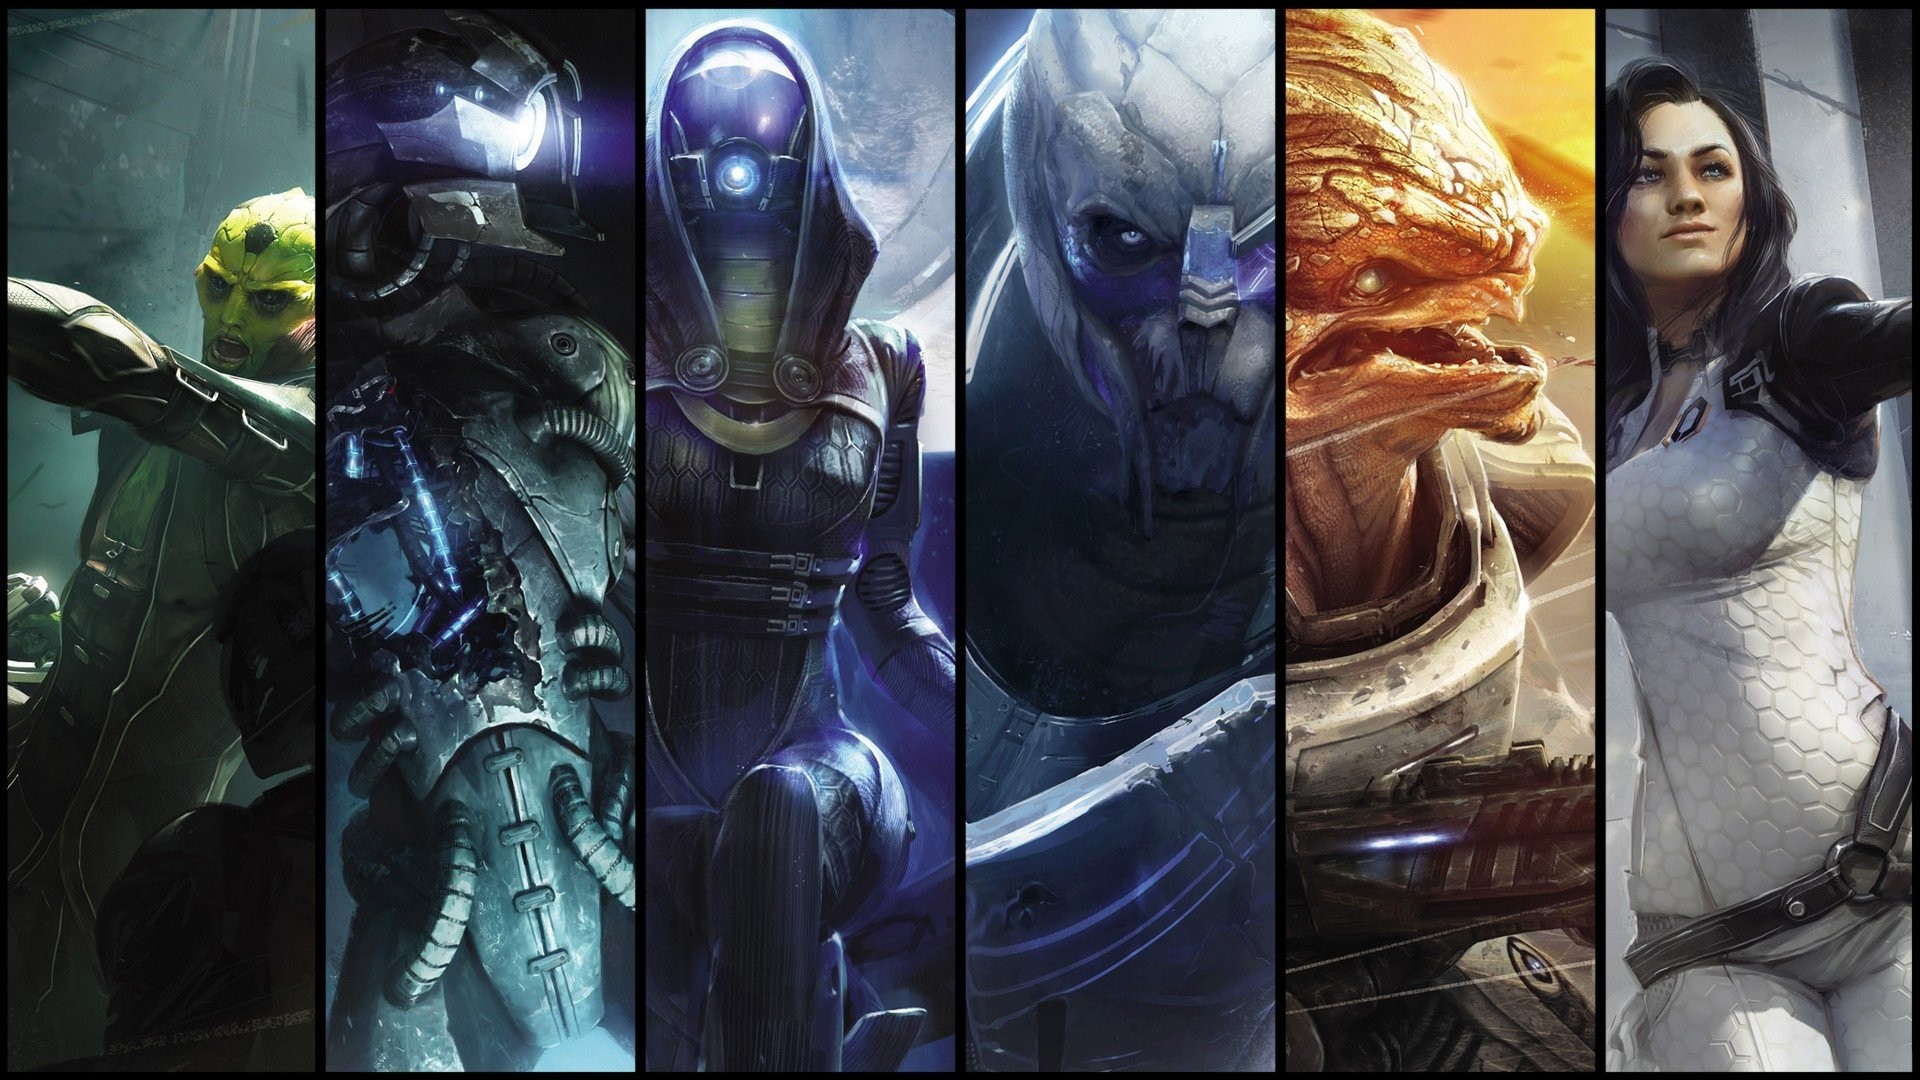 video games legion Mass Effect Miranda Lawson grunt Mass Effect 2 Garrus  Vakarian Thane Krios Tali